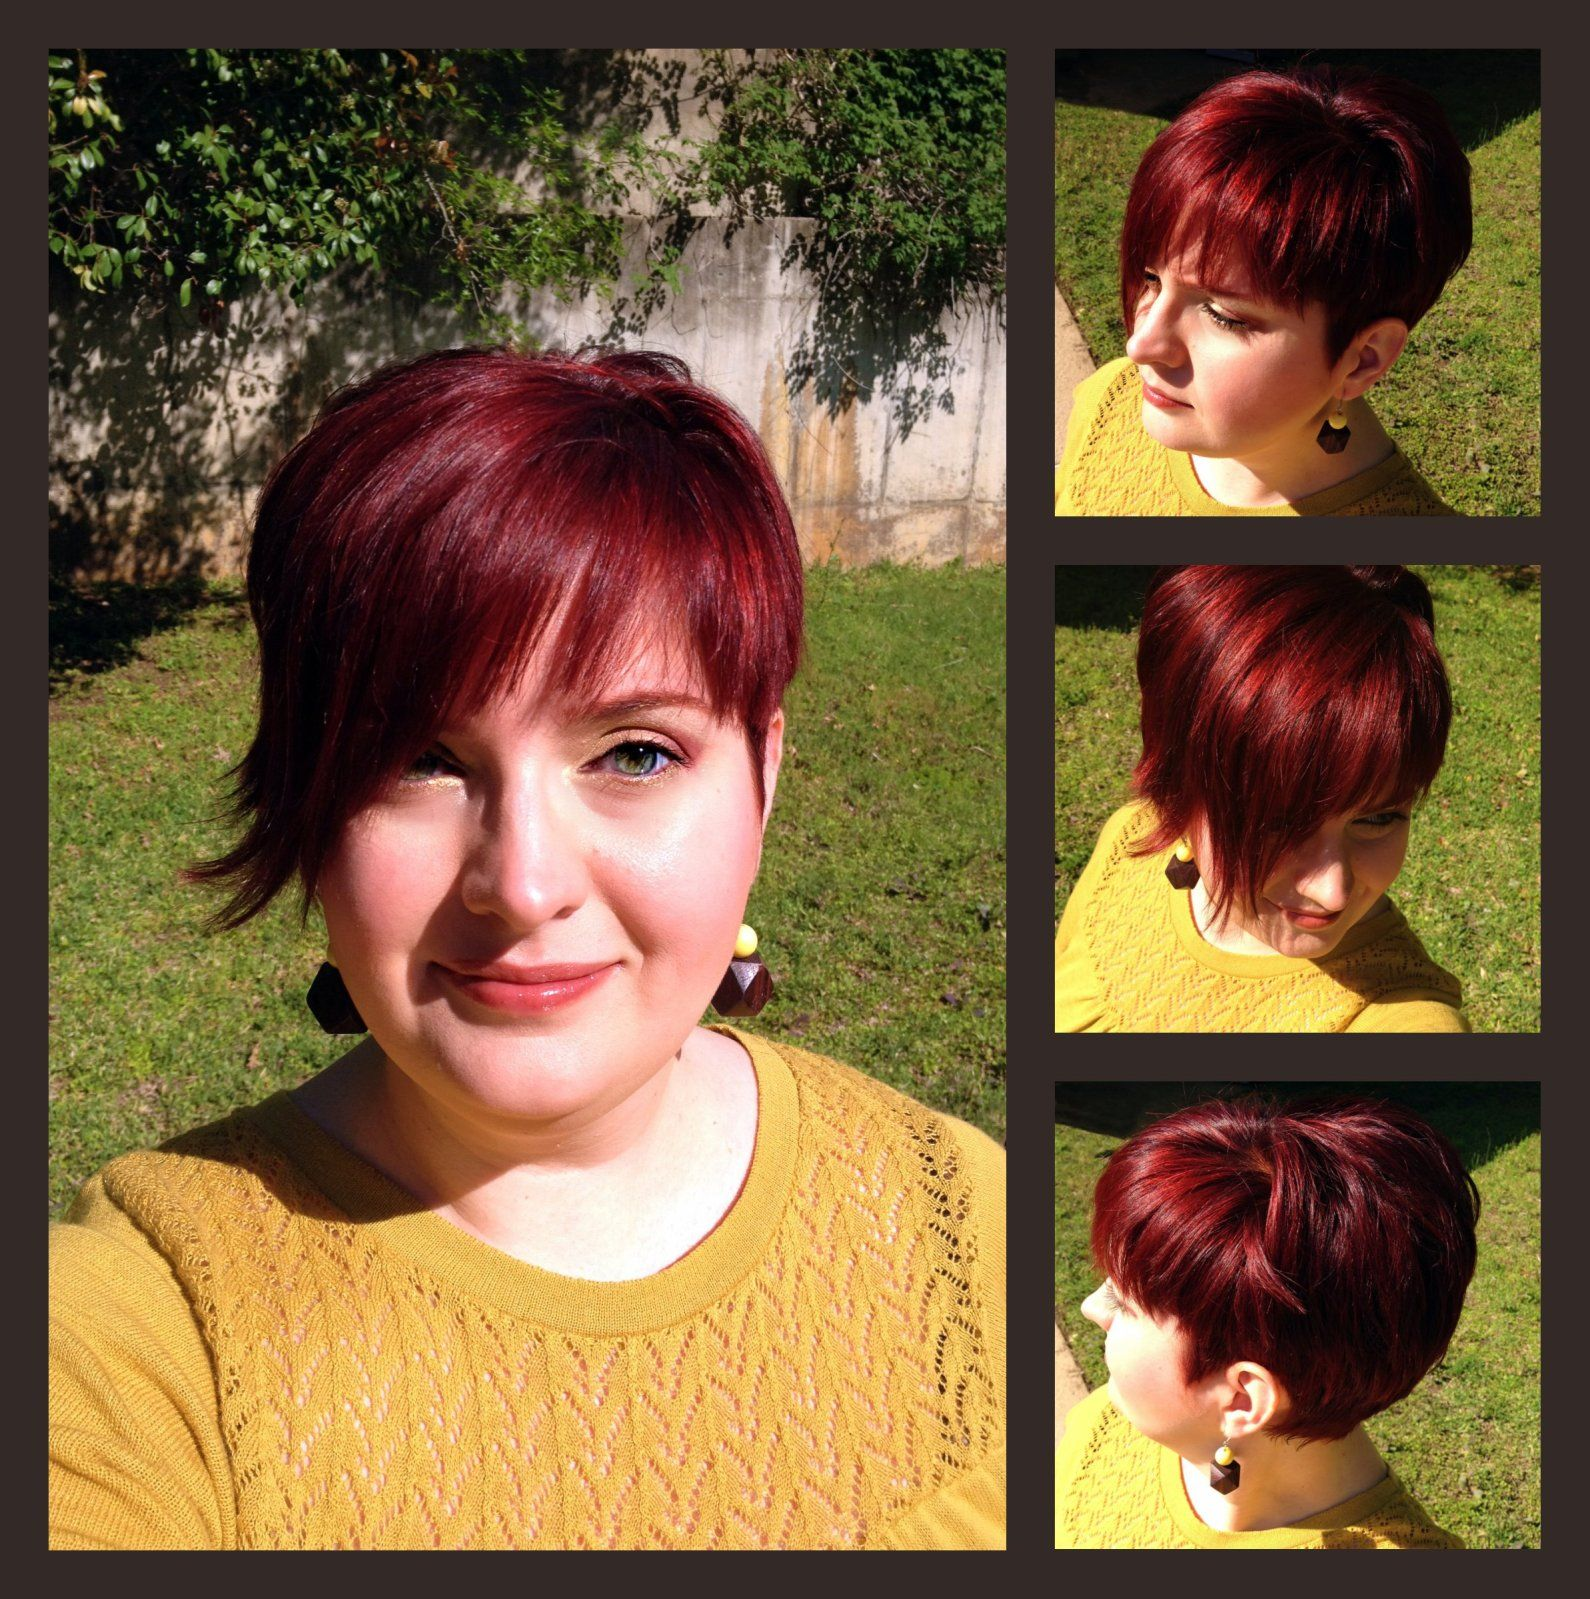 Asymmetrical Short Red Hair Does It Get Anymore Fun Than That Short Red Hair Short Hair Styles Stylish Hair